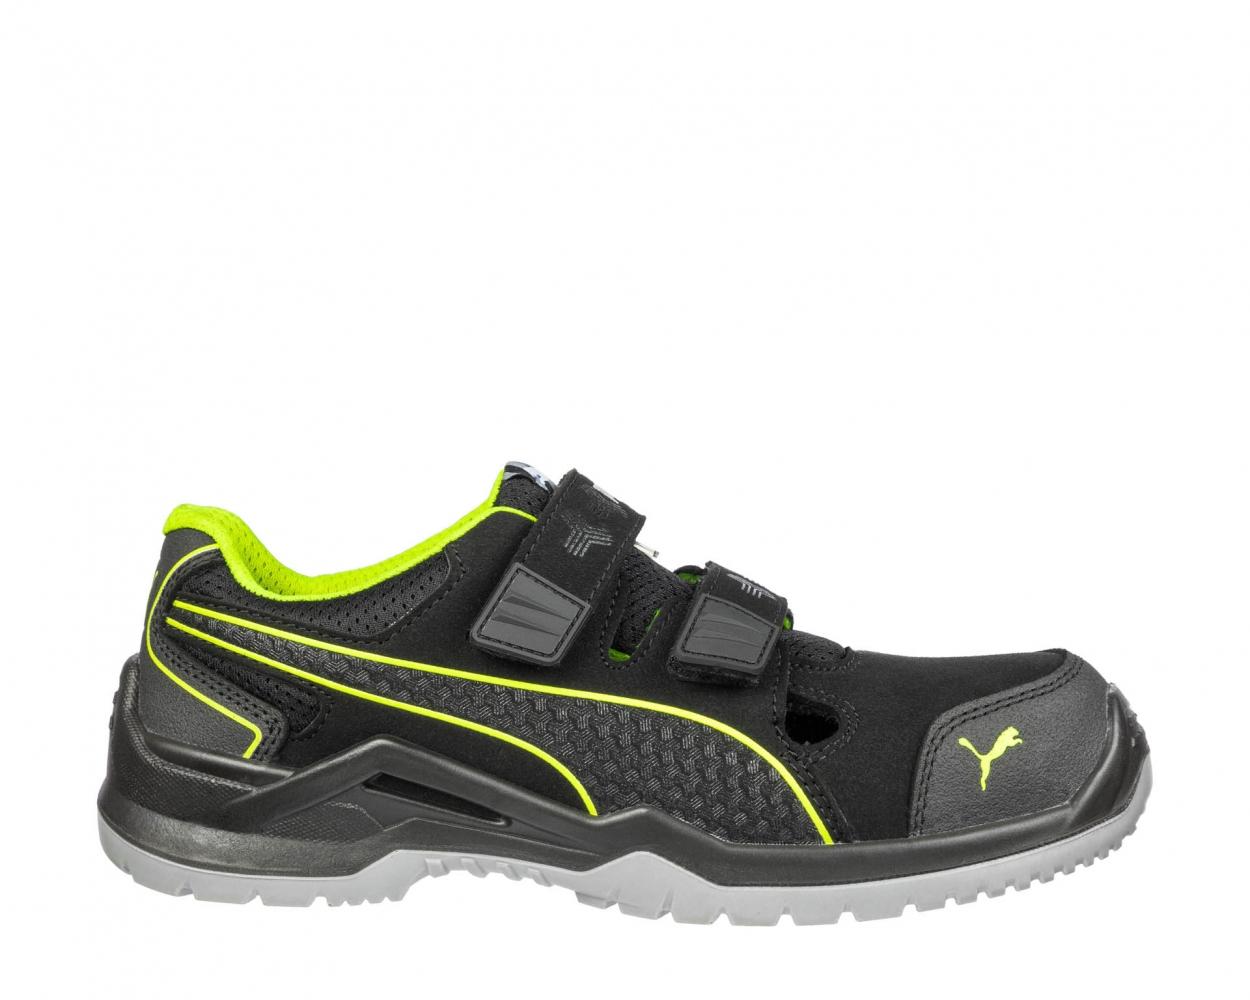 Puma 644300 NEODYME GREEN LOW Technics Line Safety shoes S1P ESD SRC